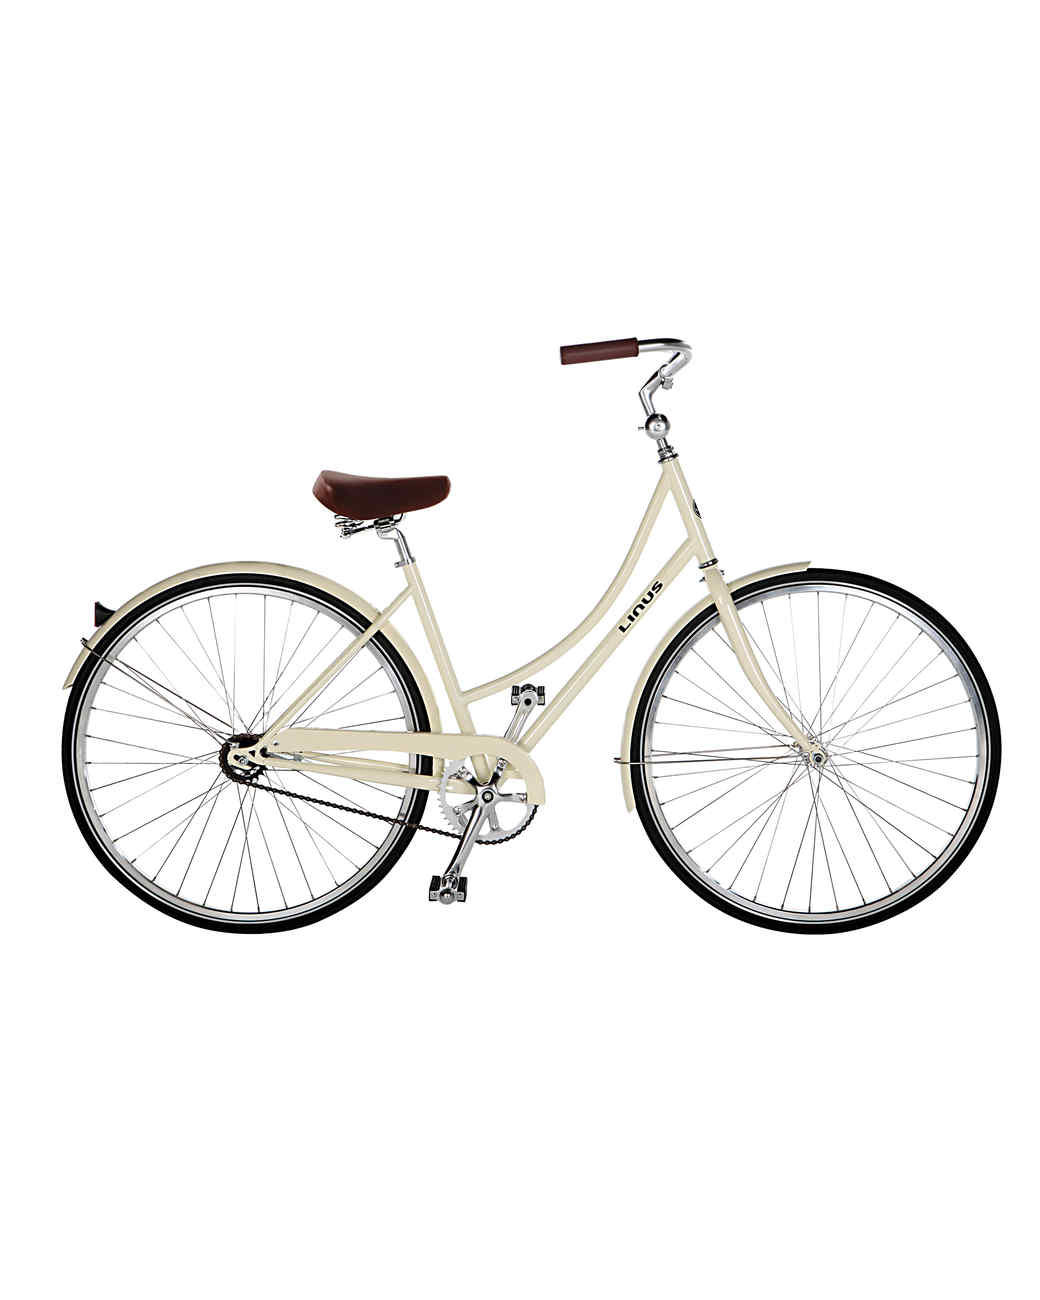 bicycle-dutchi1-creamms111044.jpg